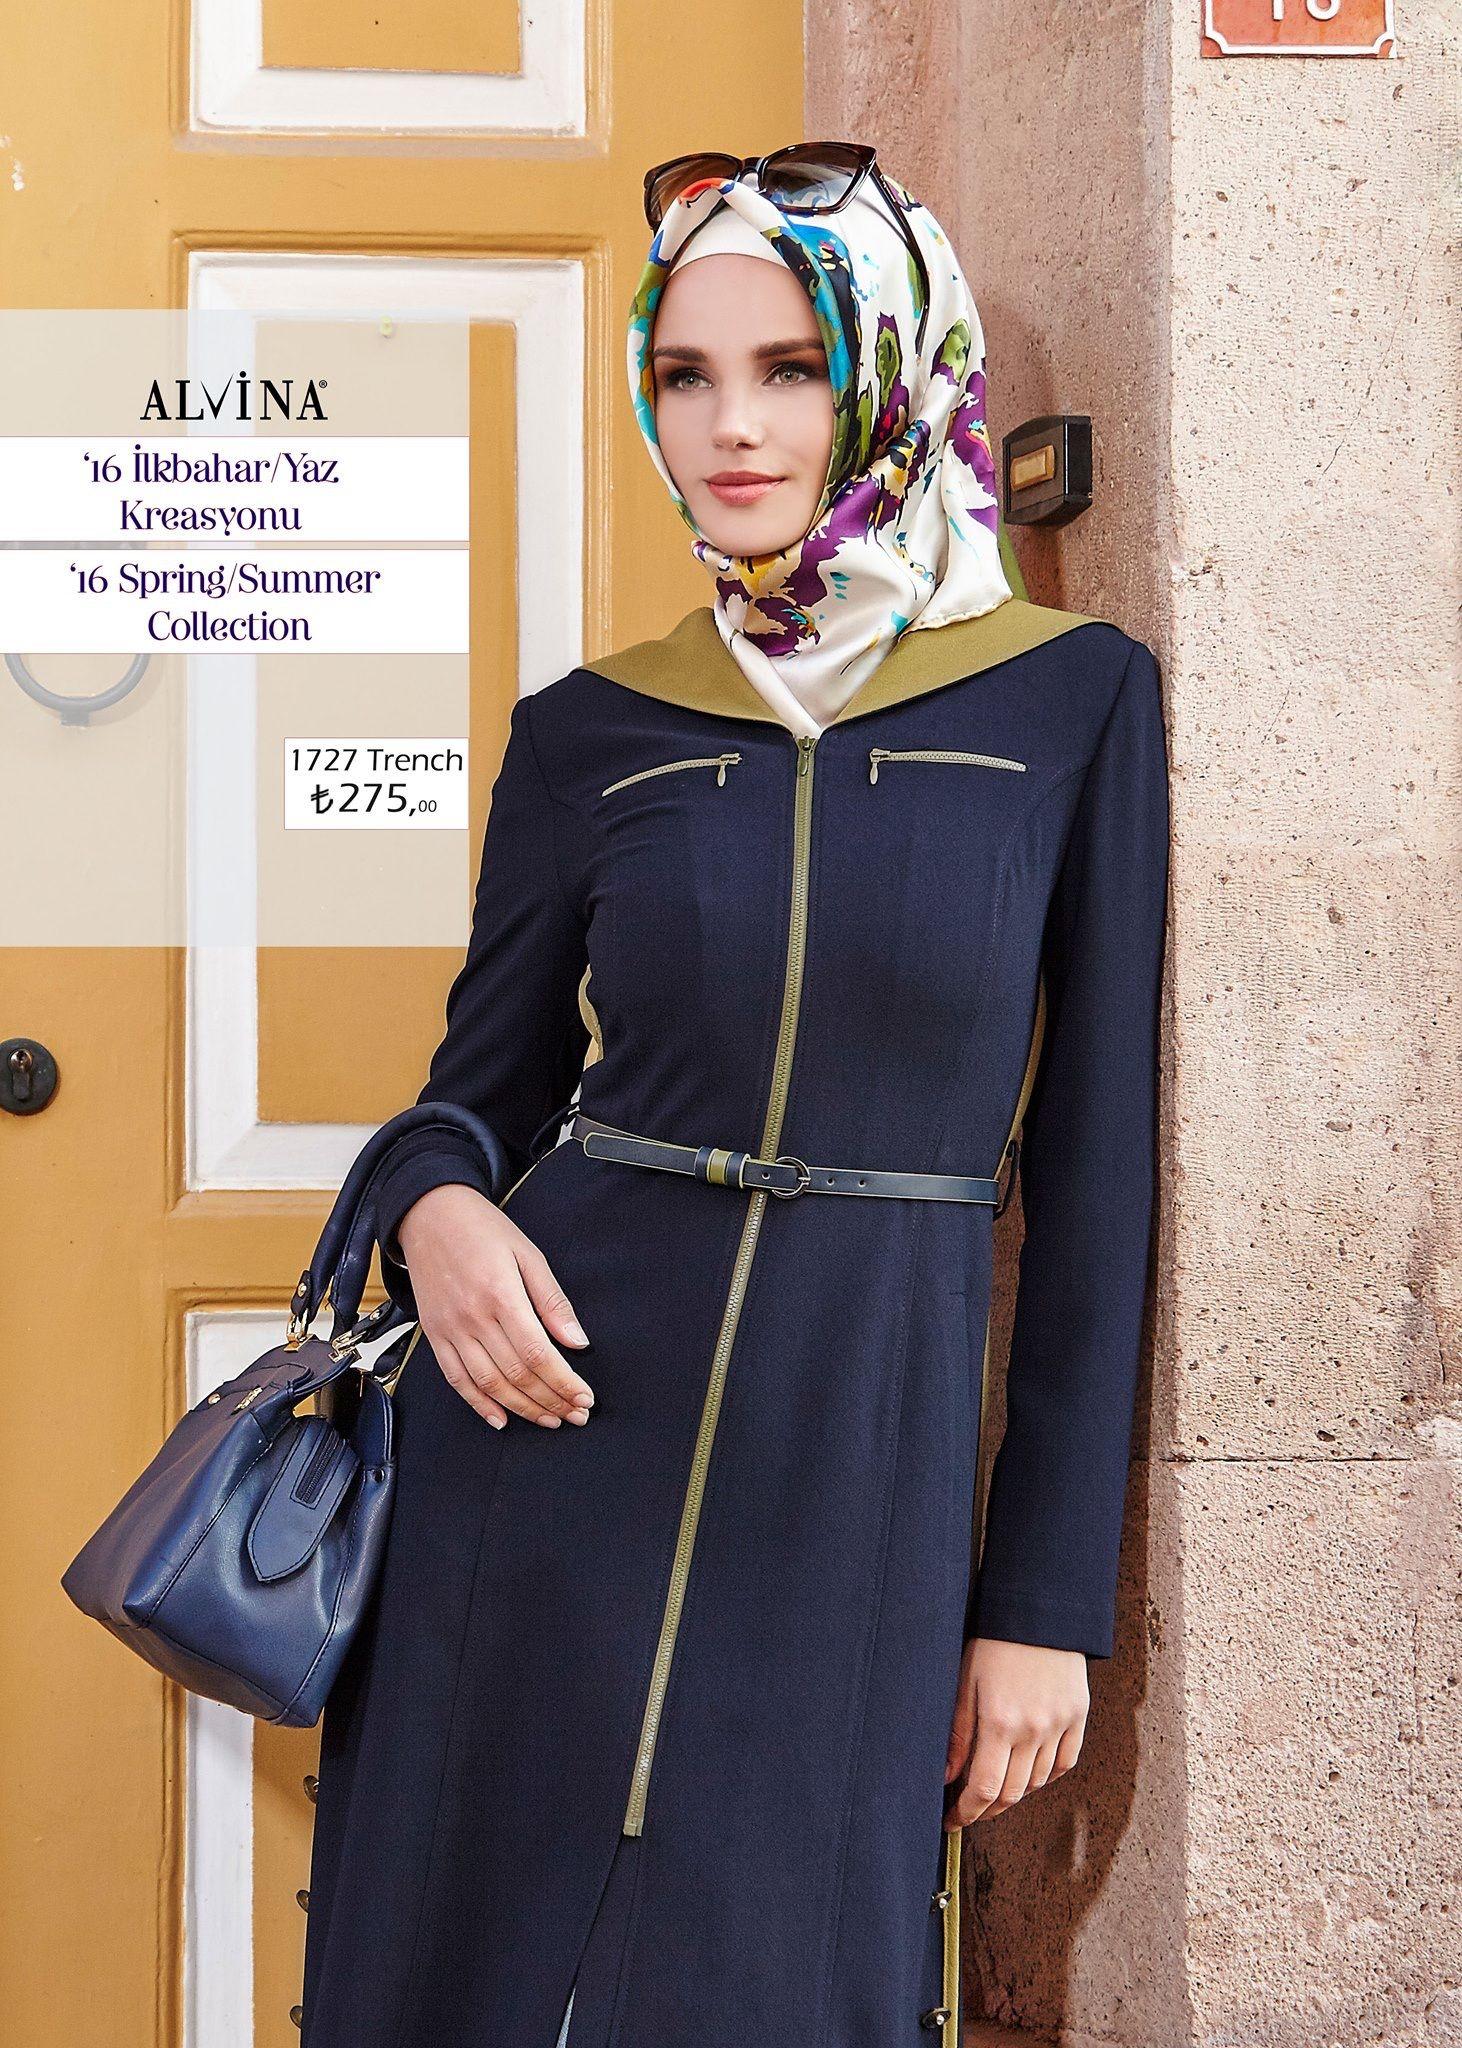 Pin Oleh Ziah Arsyadi Di Fashion Hijab Kerudung